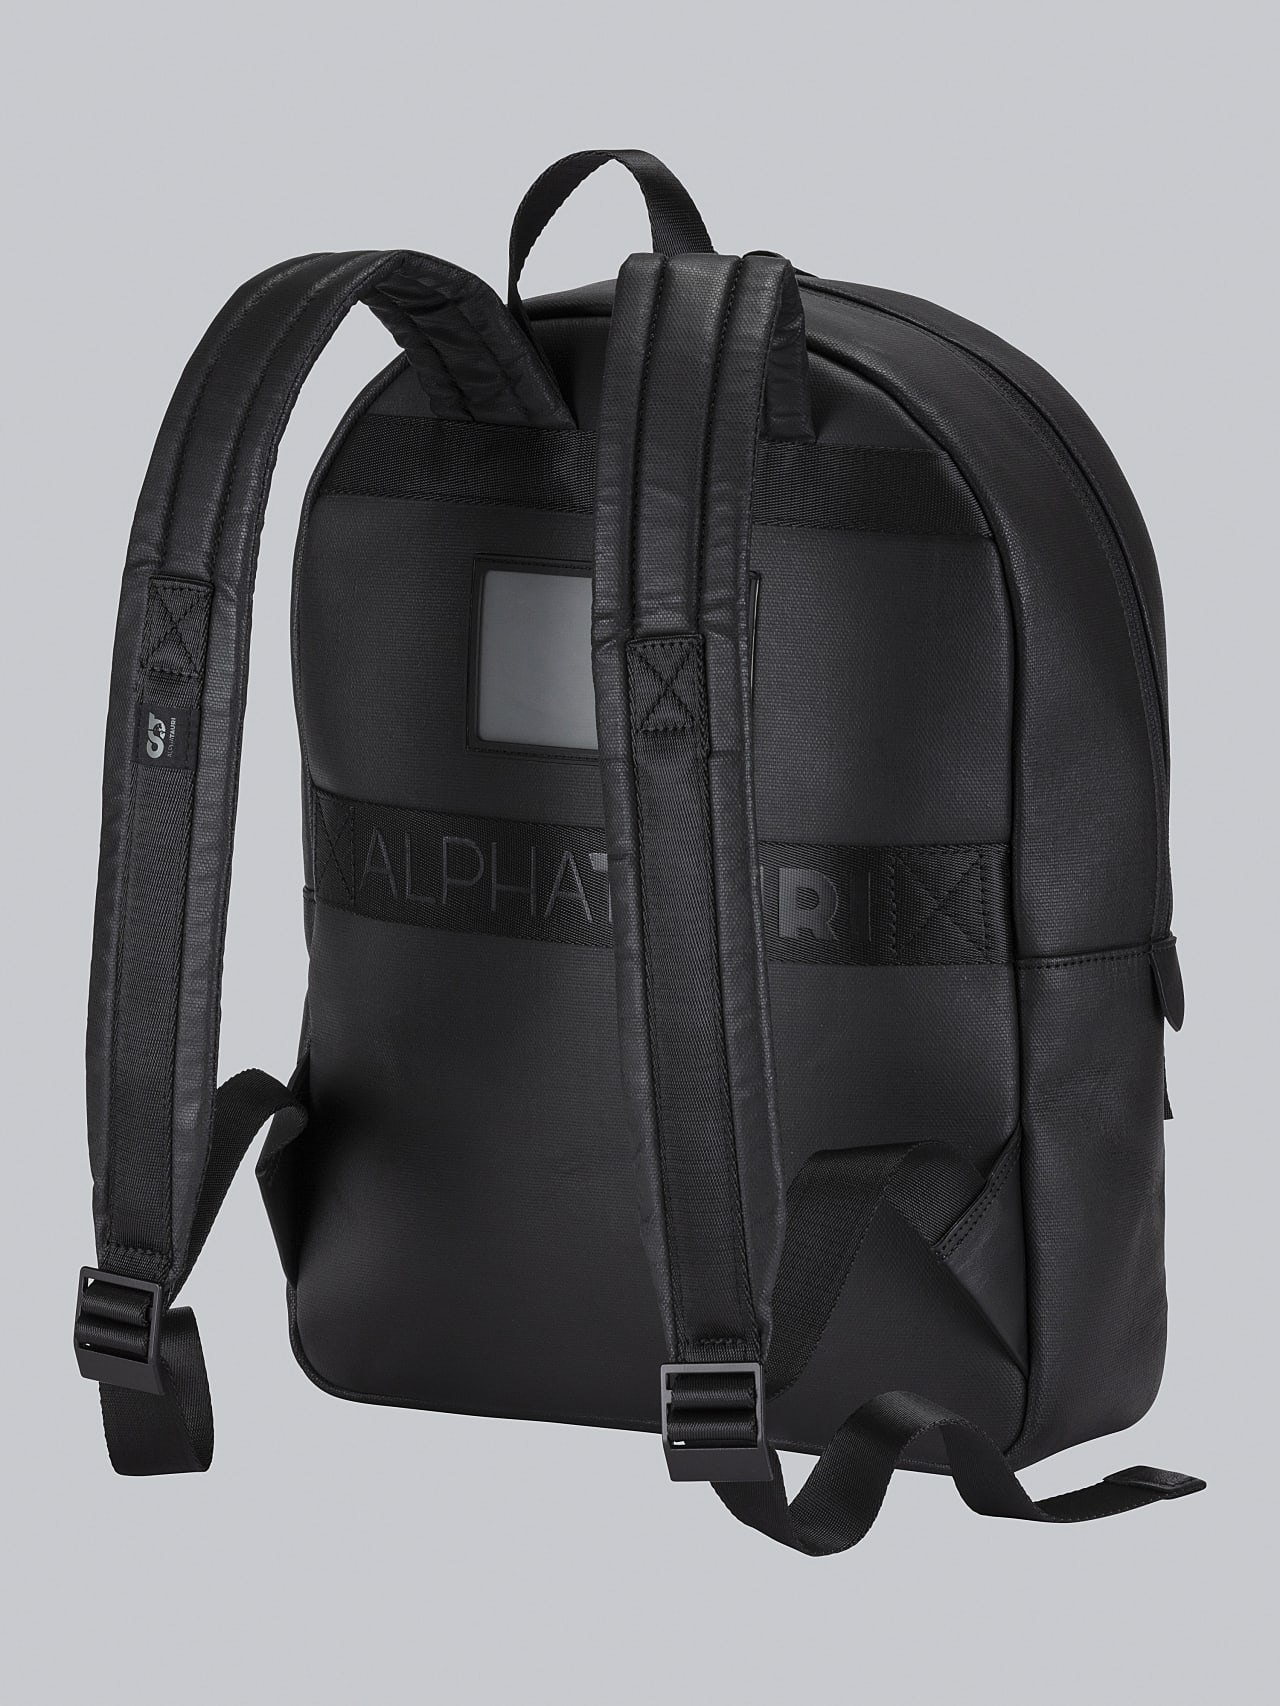 AREKK V2.Y5.02 Water-Repellent Backpack dark grey / anthracite Left Alpha Tauri